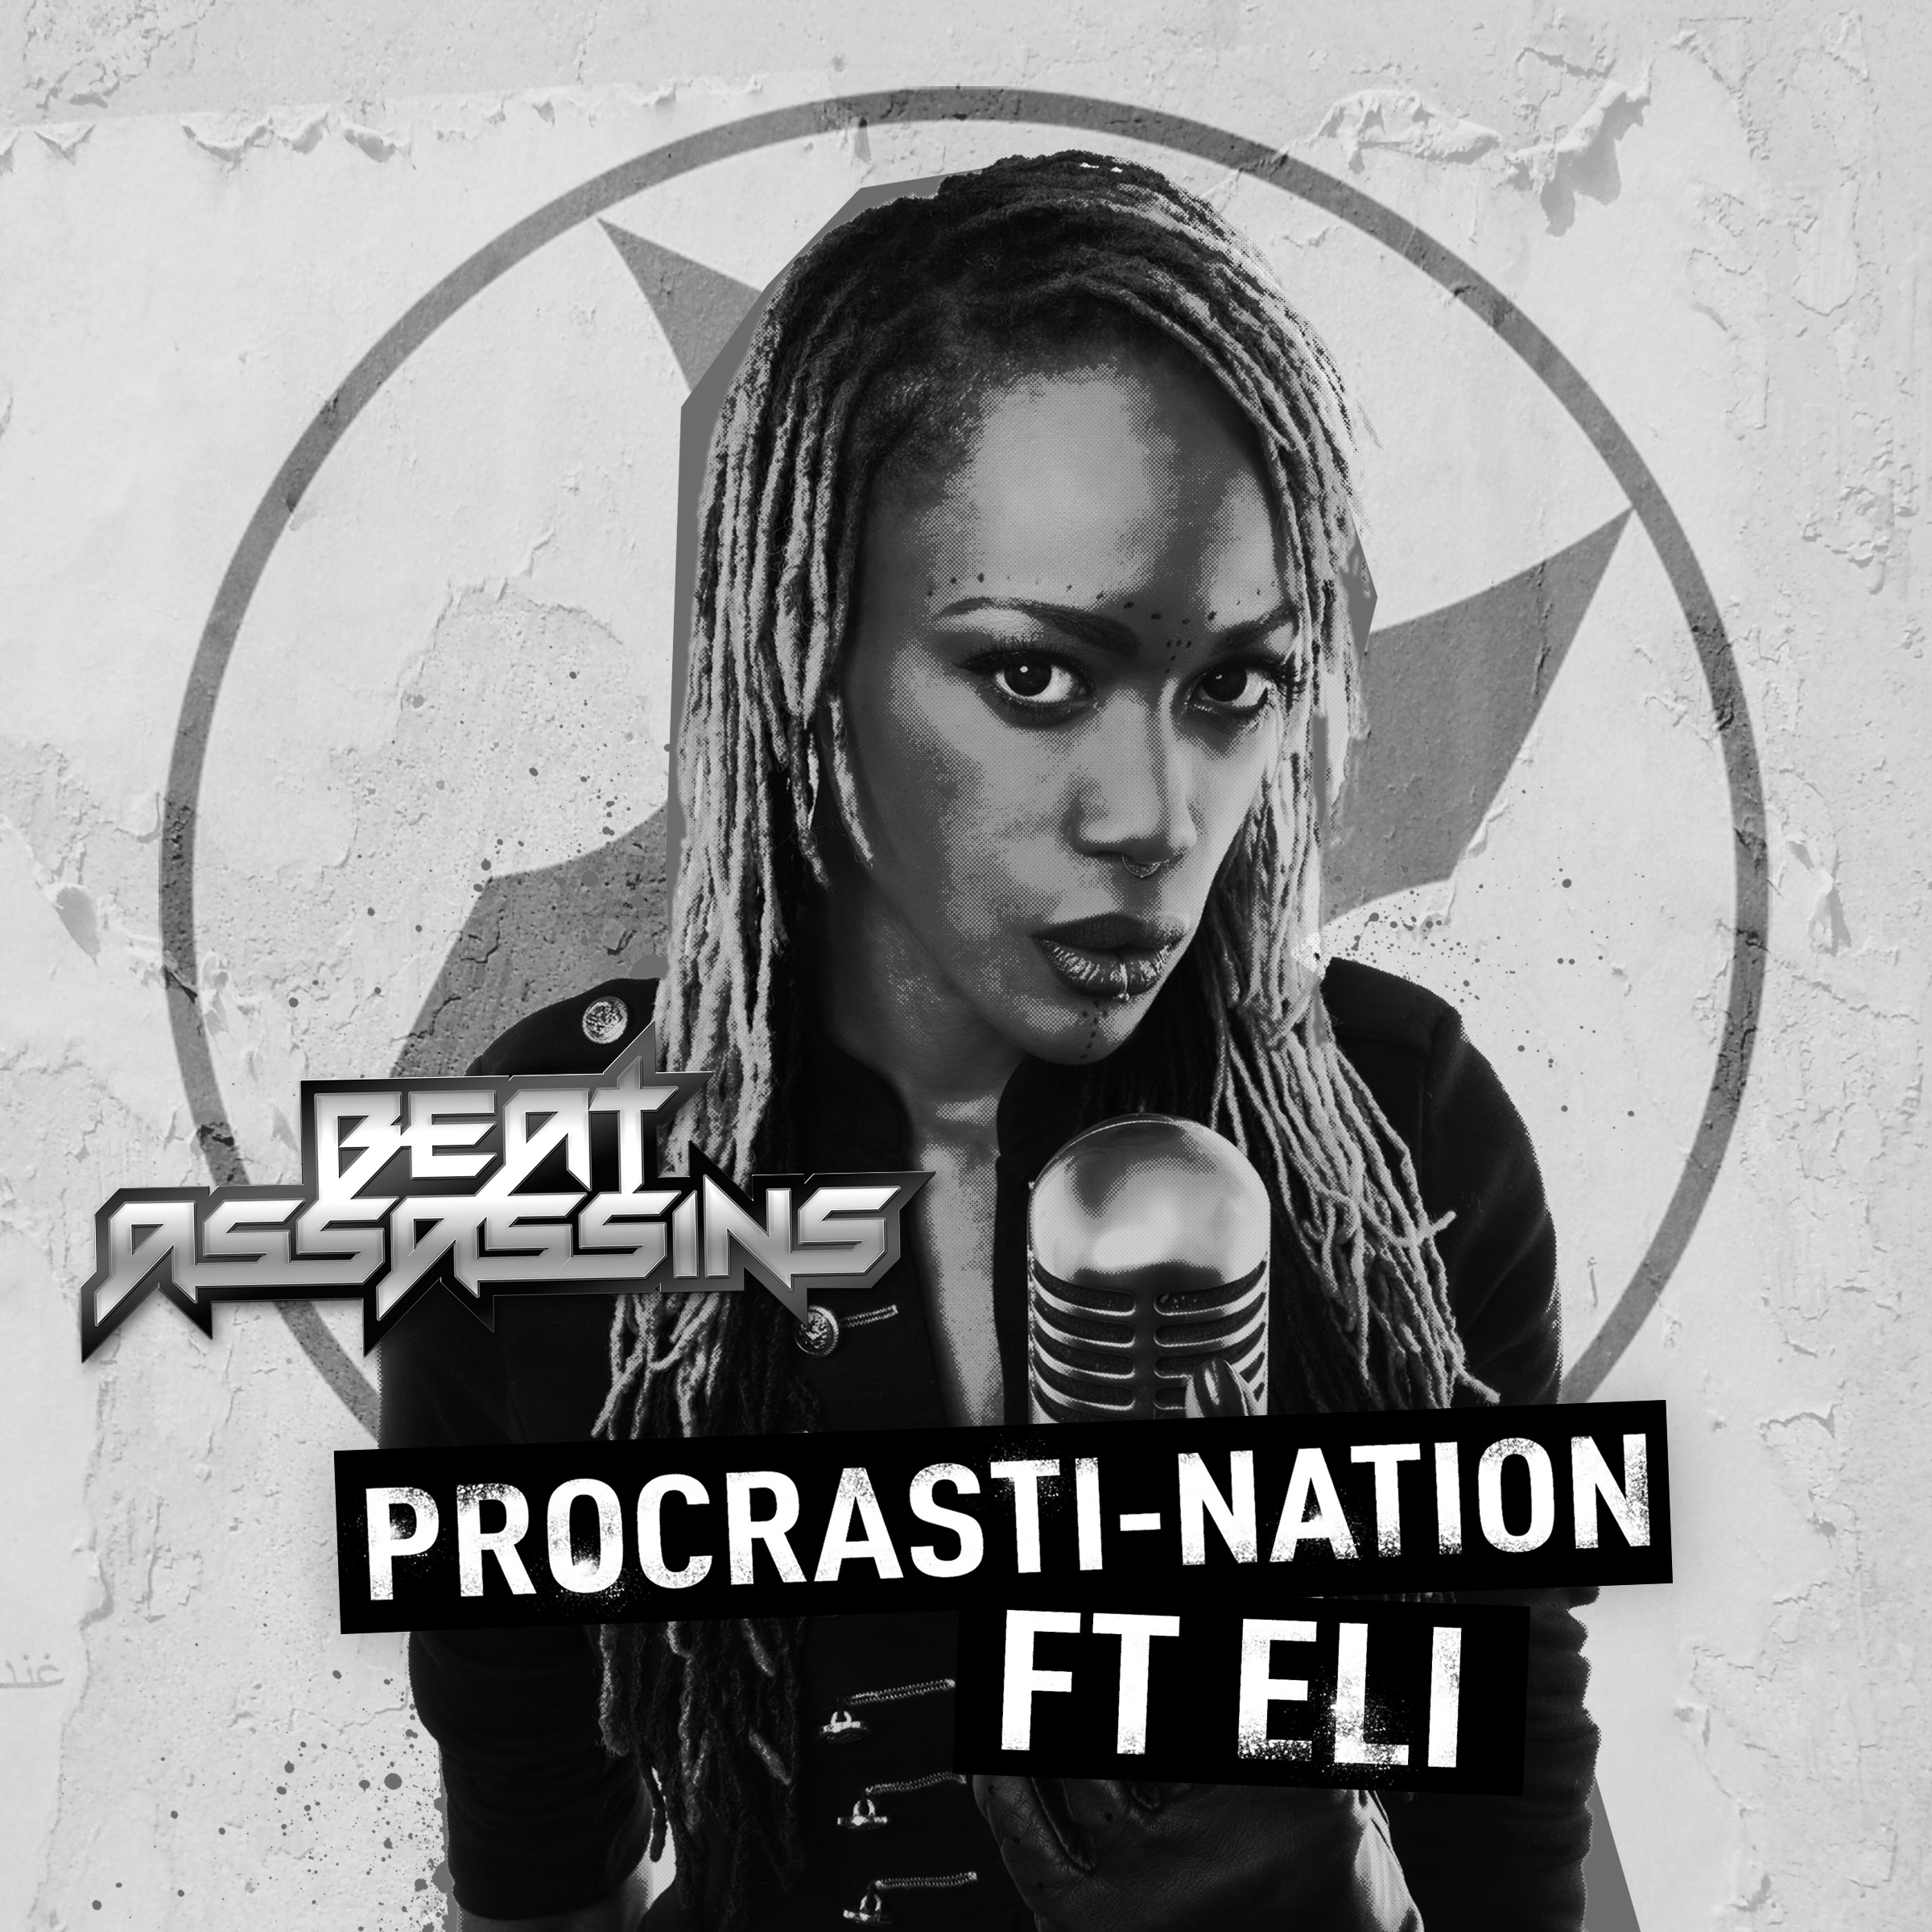 BEAT ASSASSINS - PROCRASTI-NATION ft ELi - Beat Assassins